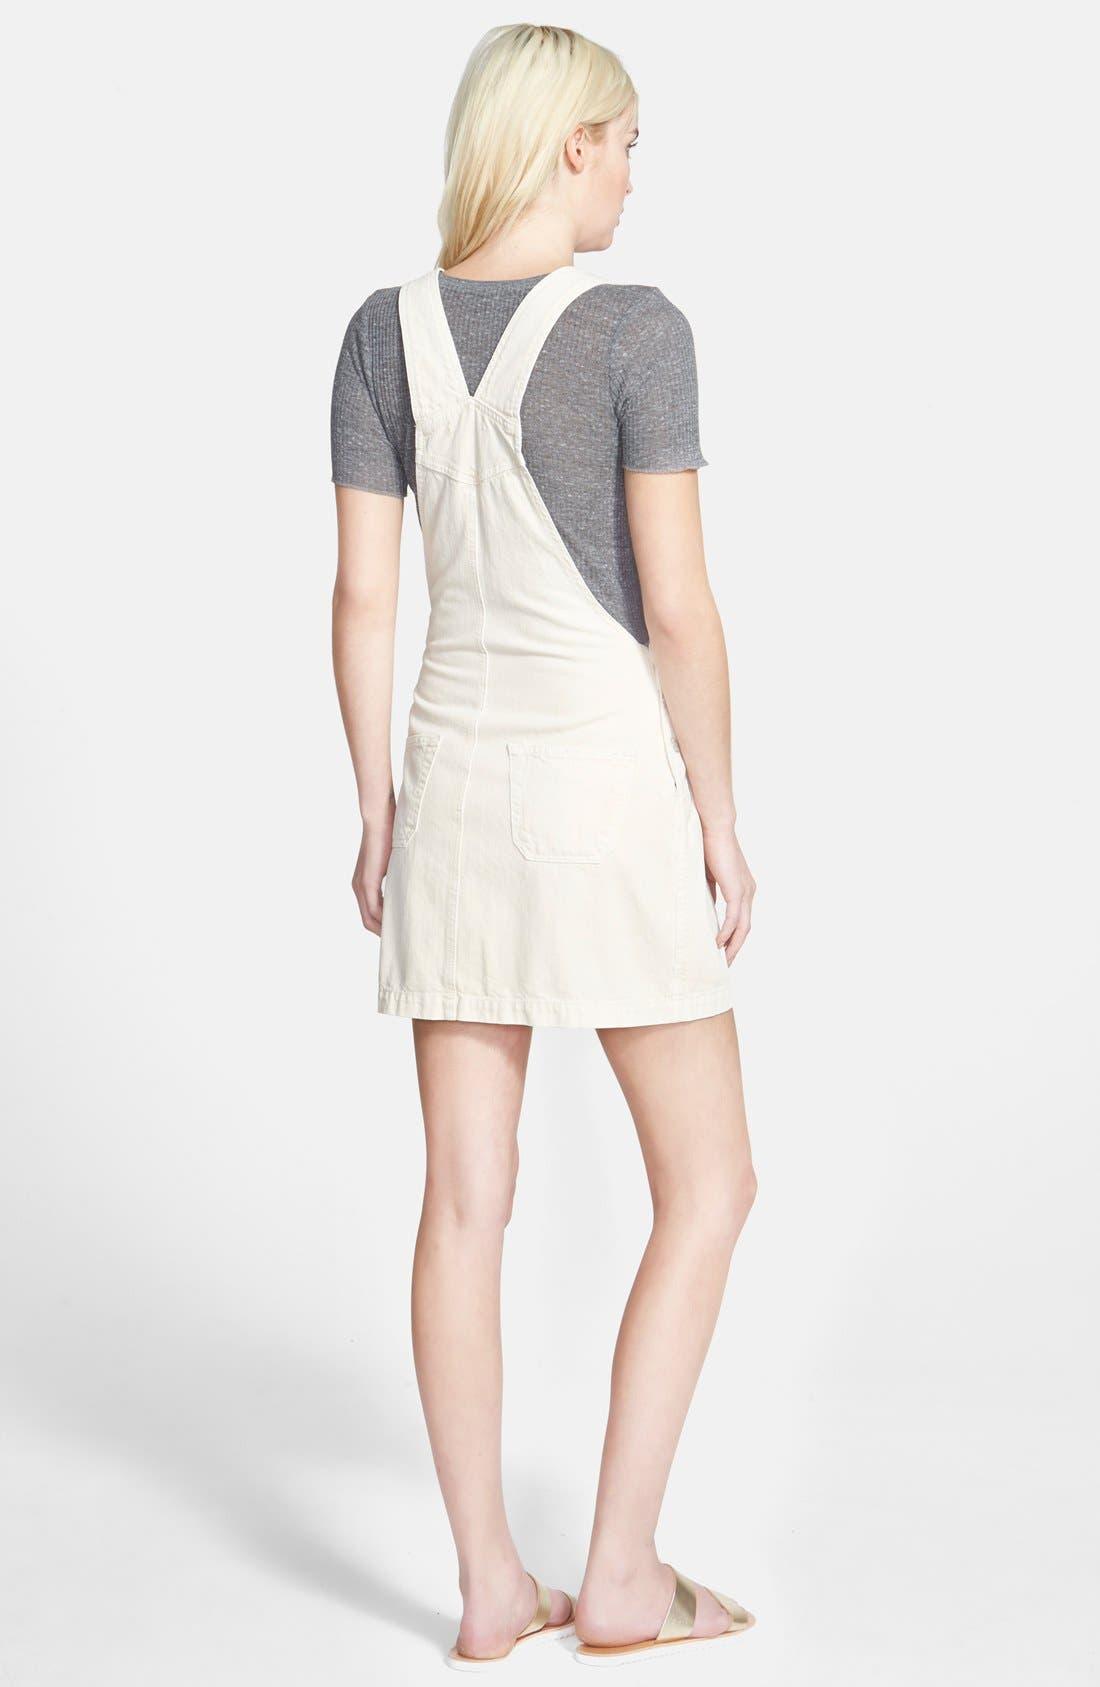 Alexa Chung for AG 'The Gillian' Overalls Dress,                             Alternate thumbnail 2, color,                             100